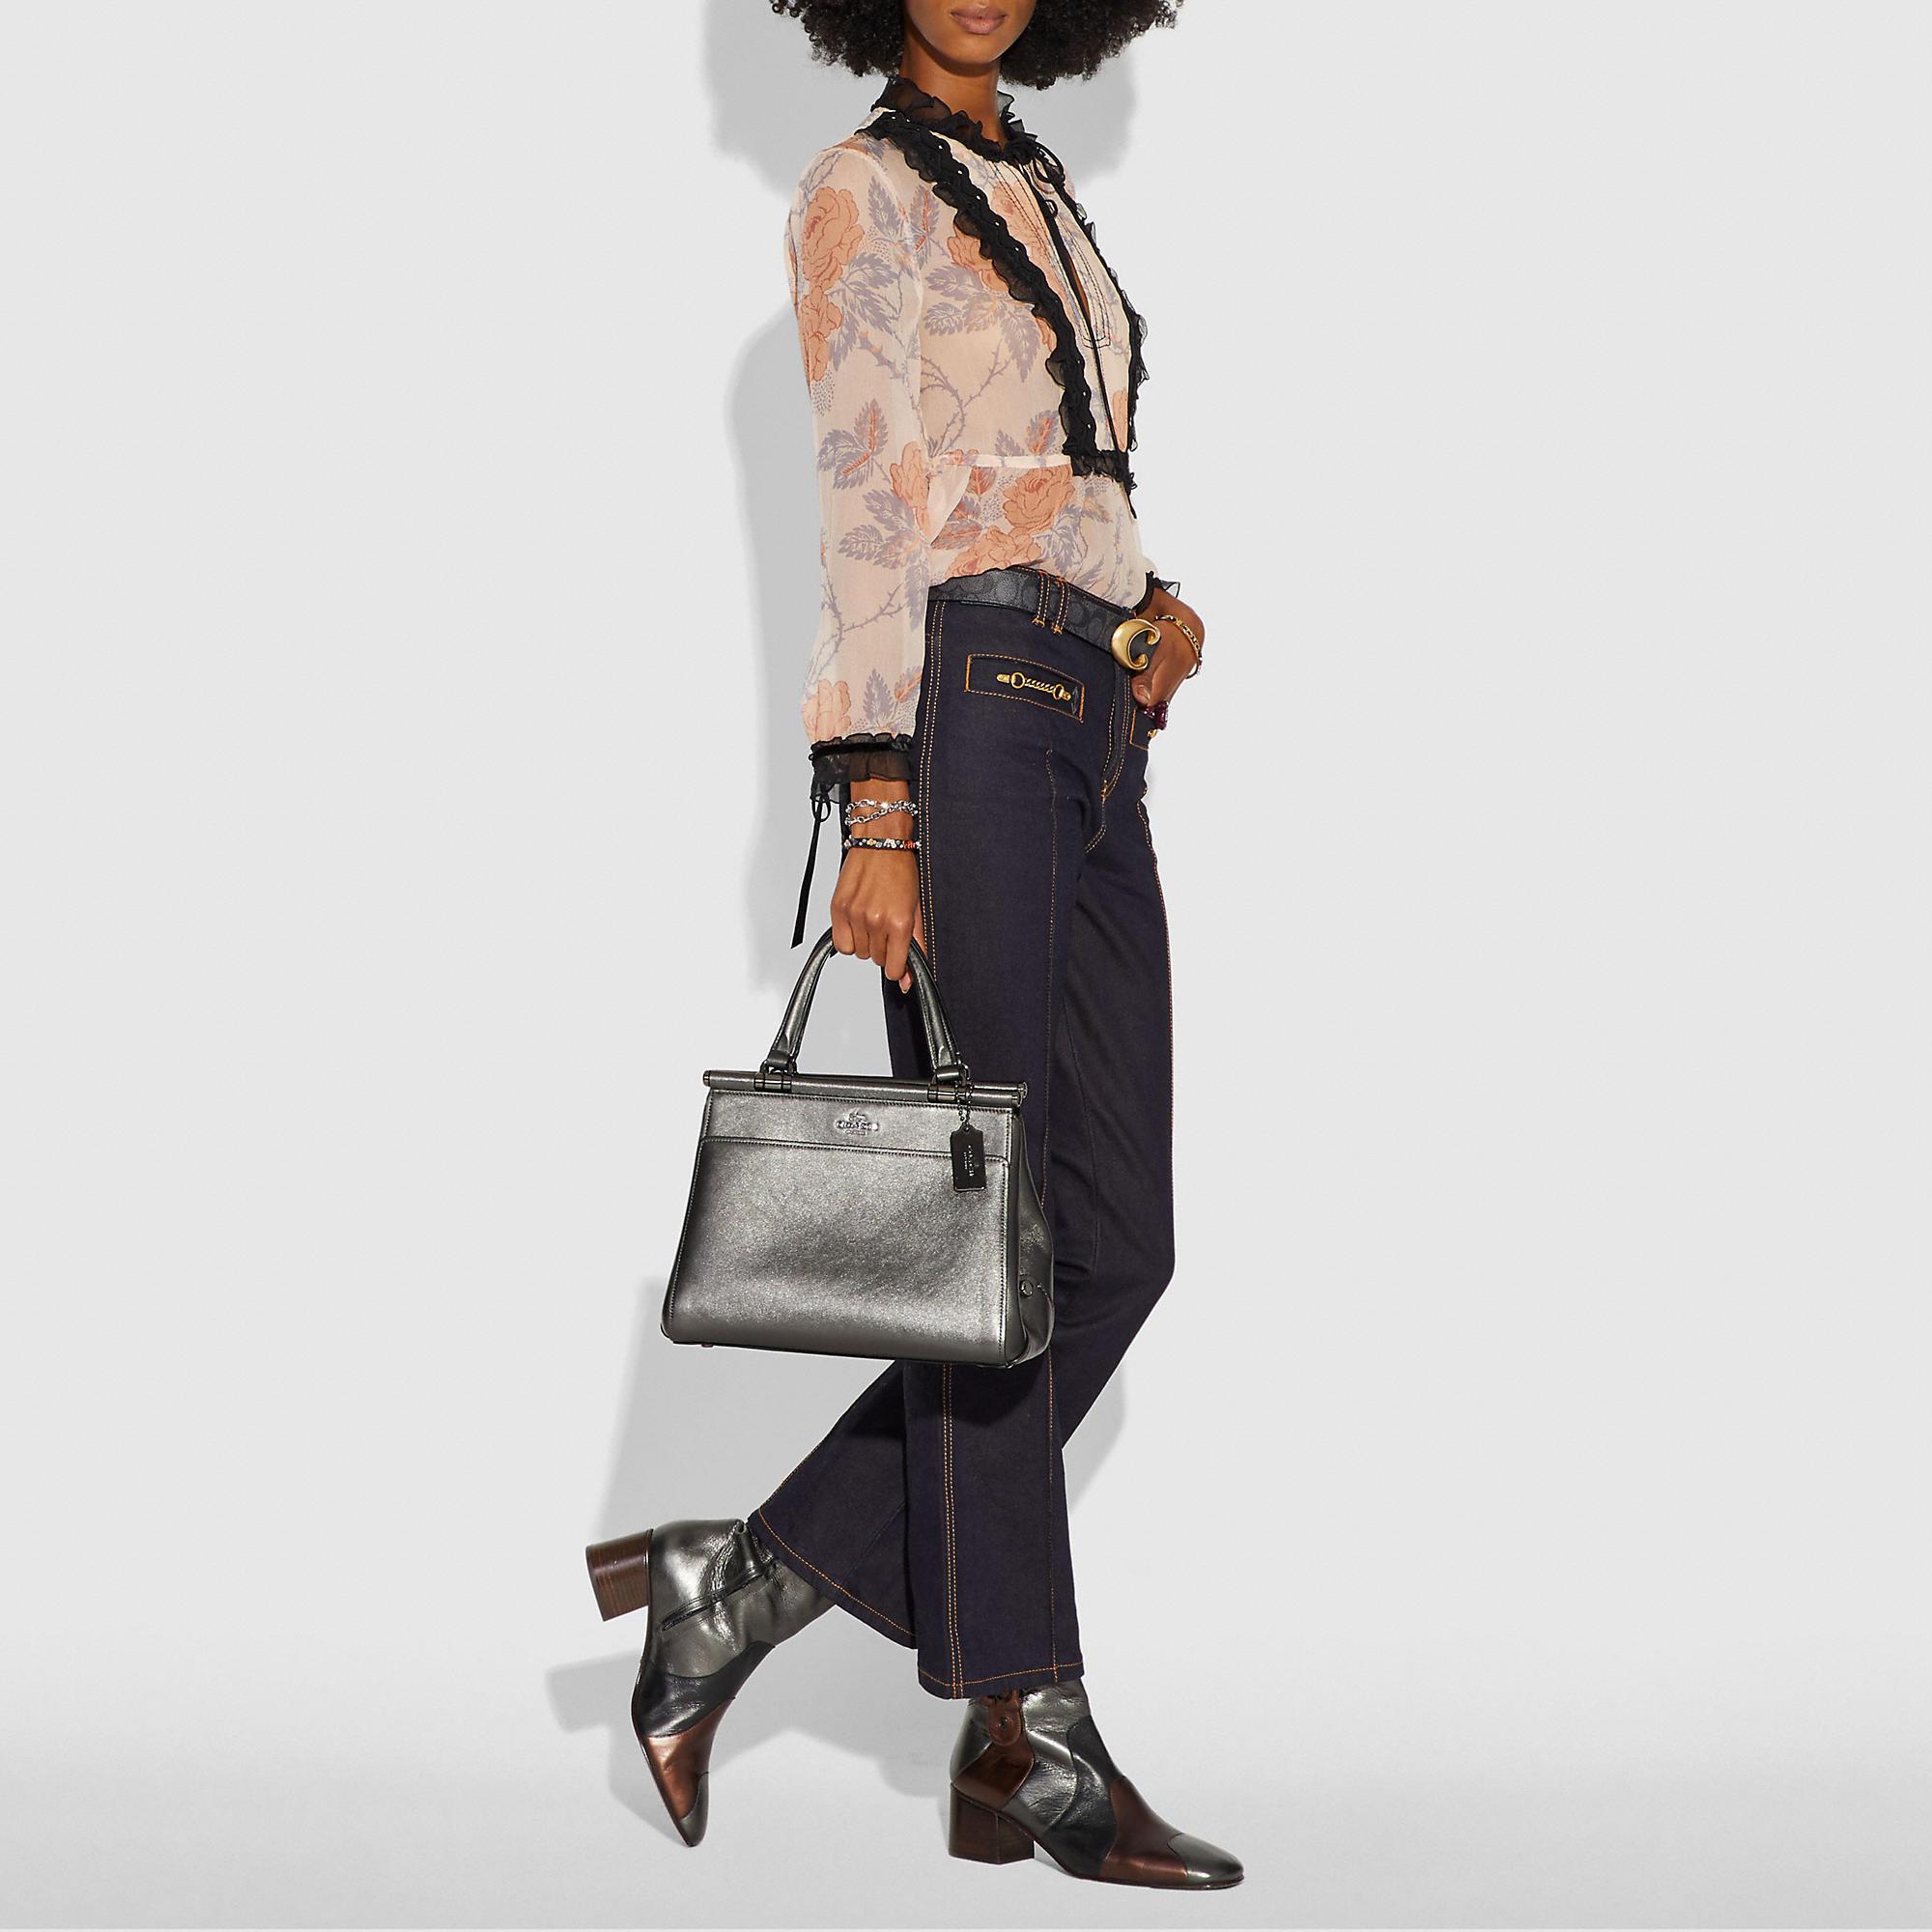 671bdce215ee COACH Grace Bag In Metallic Leather - Women s Handbags